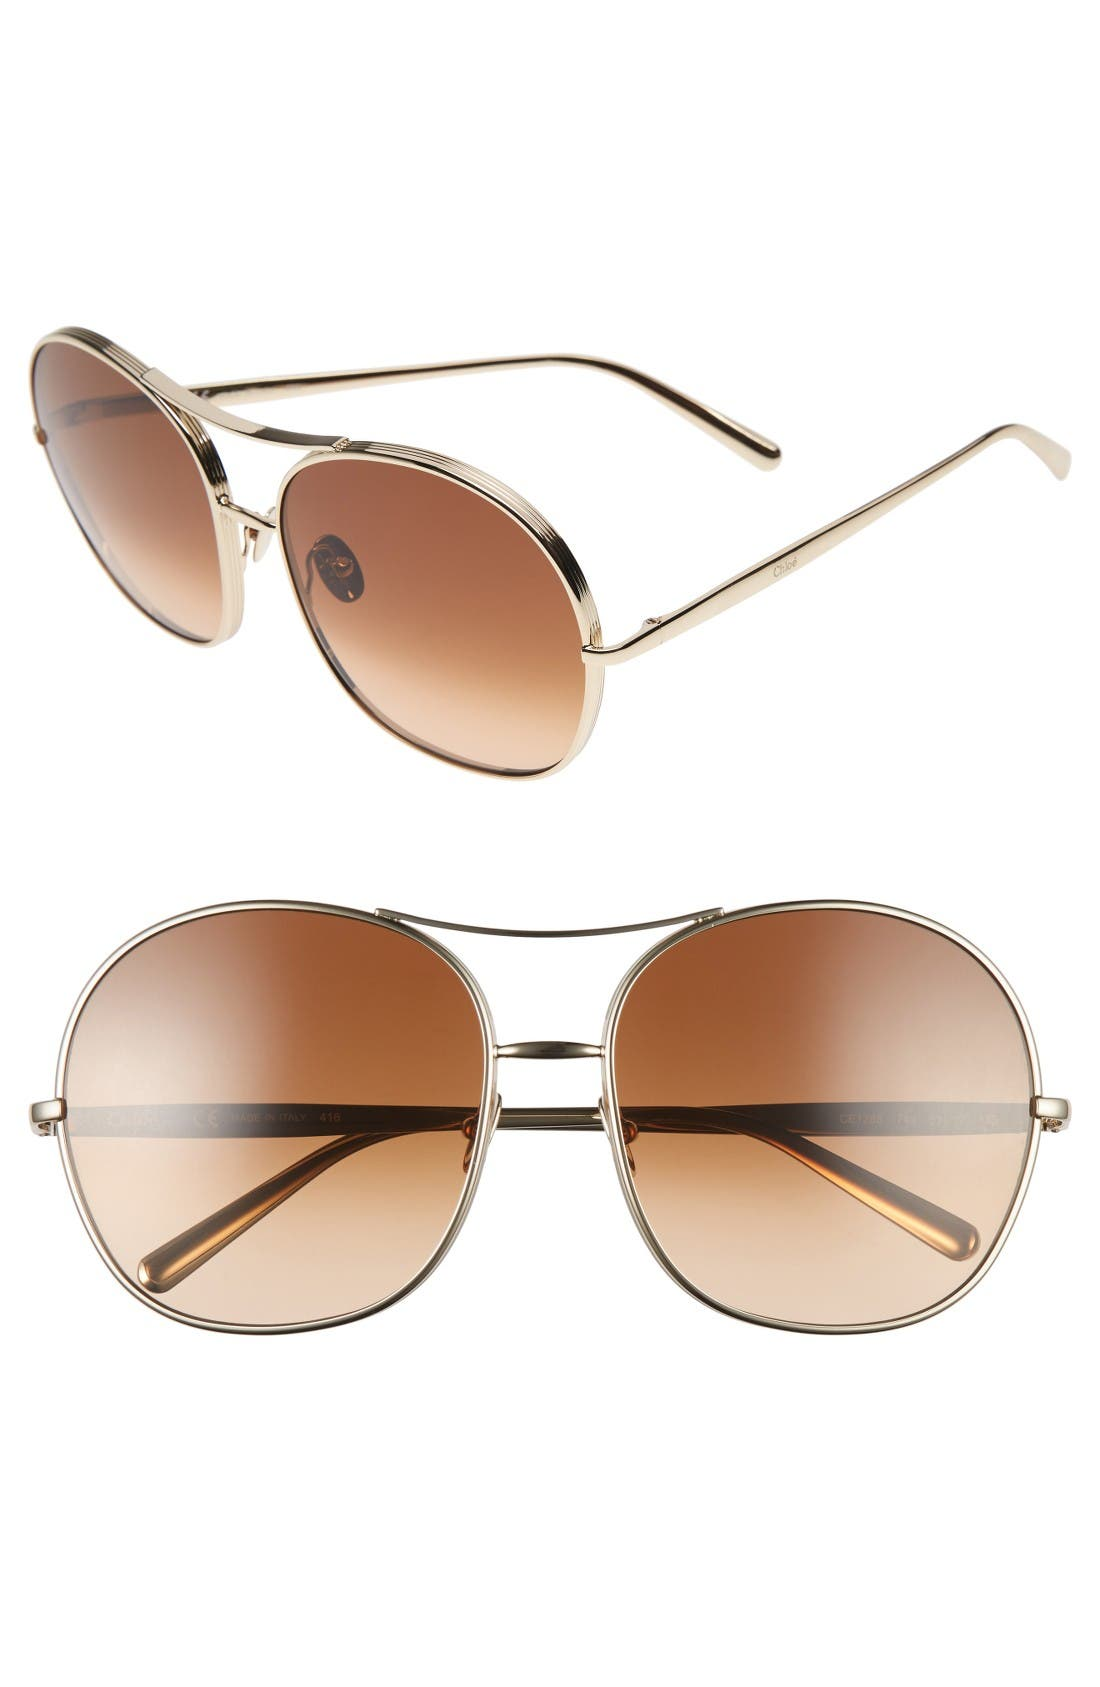 Alternate Image 1 Selected - Chloé 61mm Oversize Aviator Sunglasses